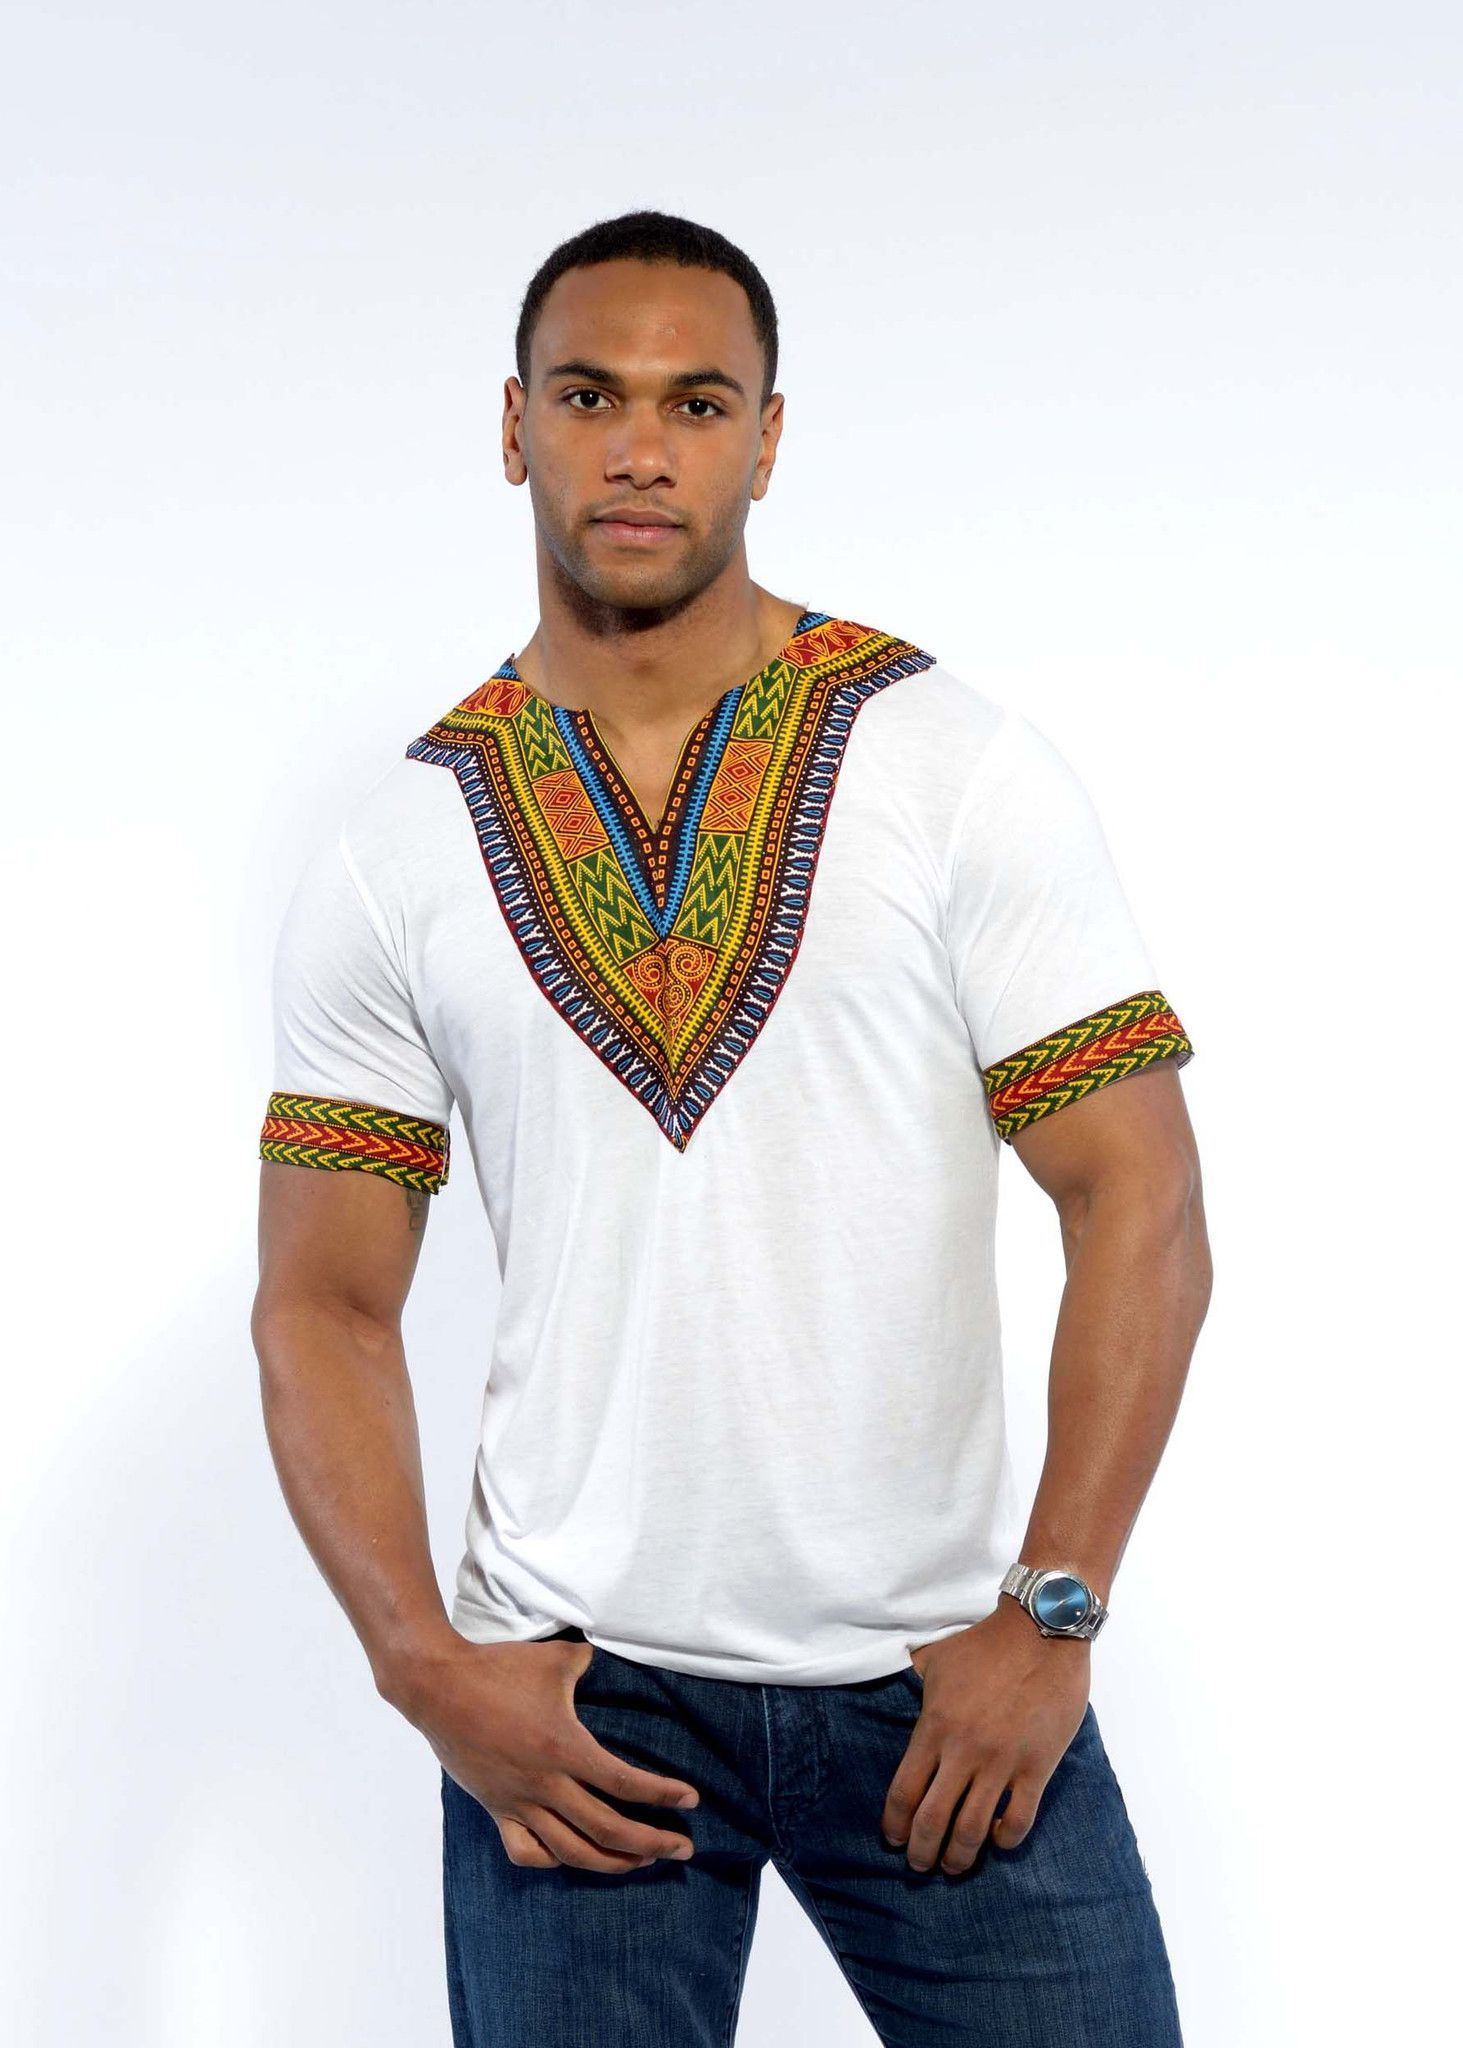 5ad608b3 Men's African Print Dashiki T-Shirt (White) in 2019 | Fashion ...